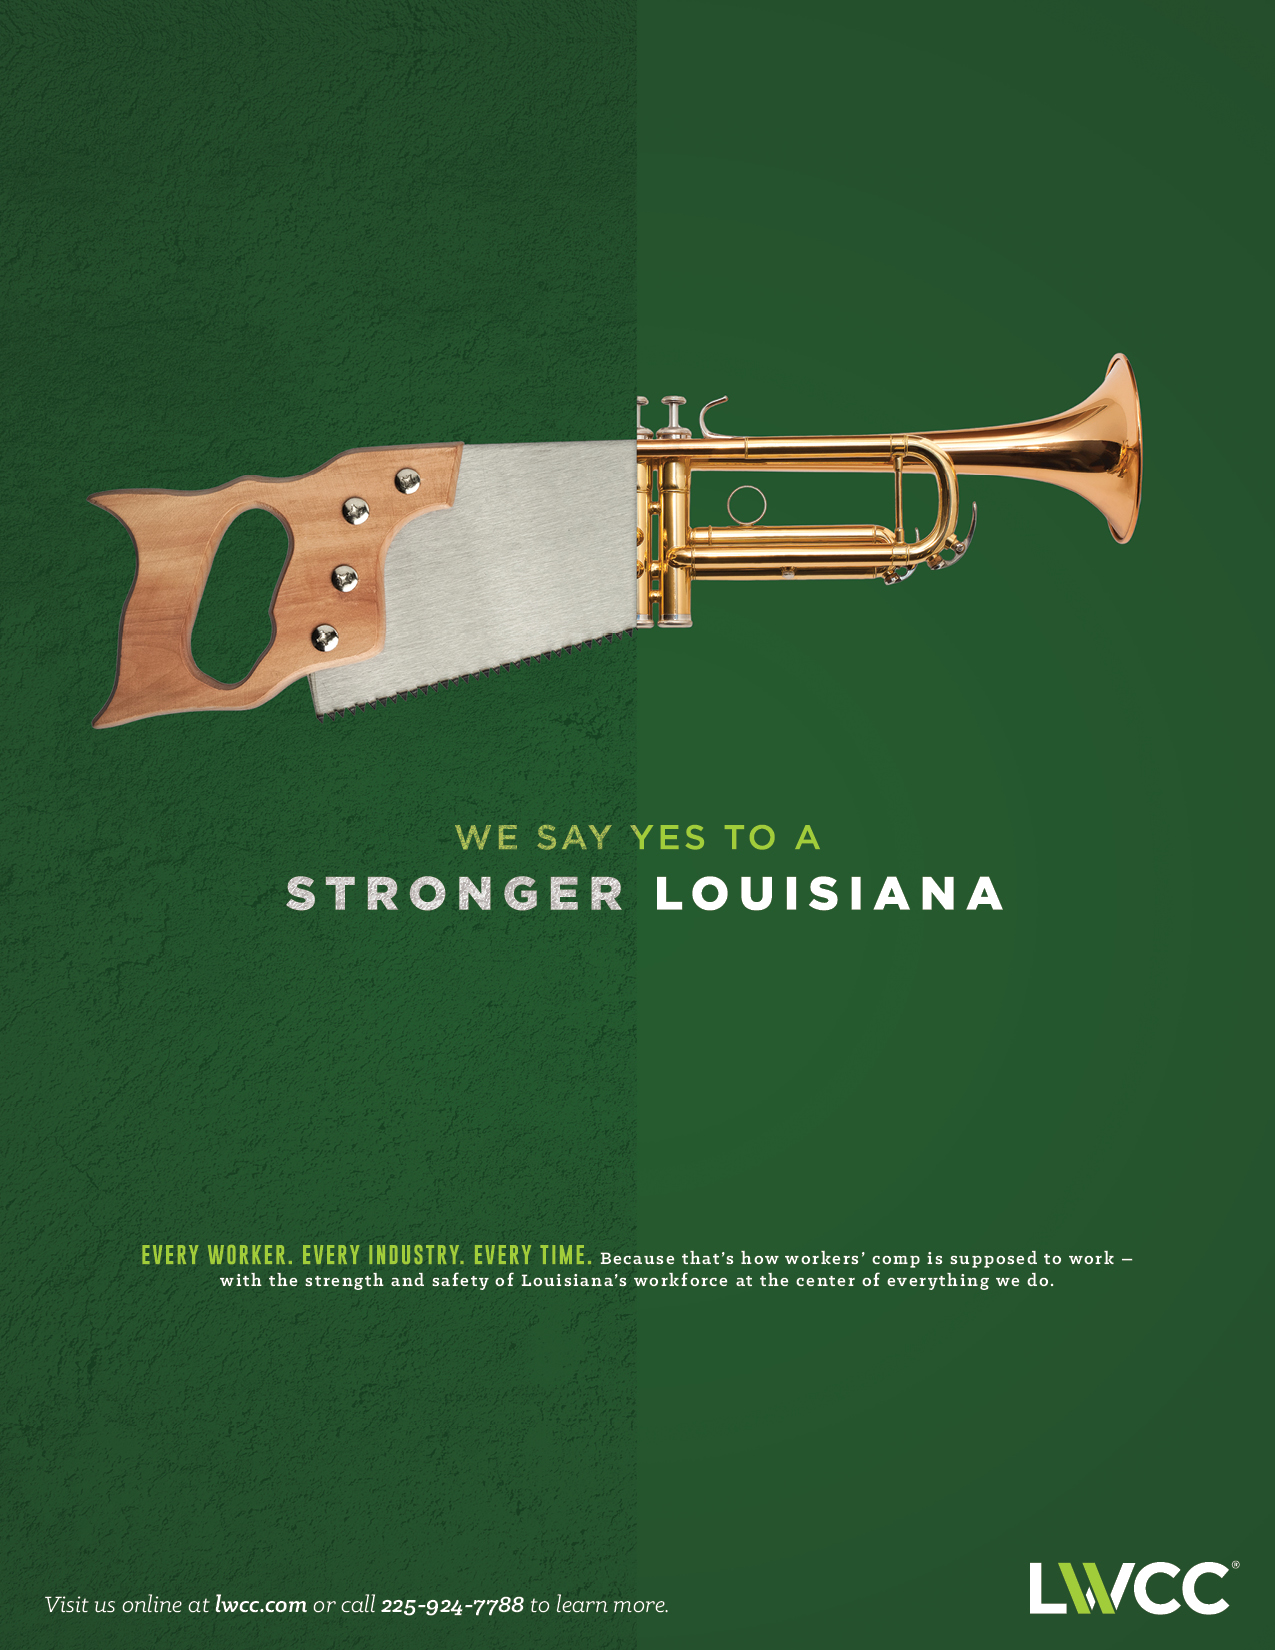 LWCC: 2016 Print Ad — Stronger